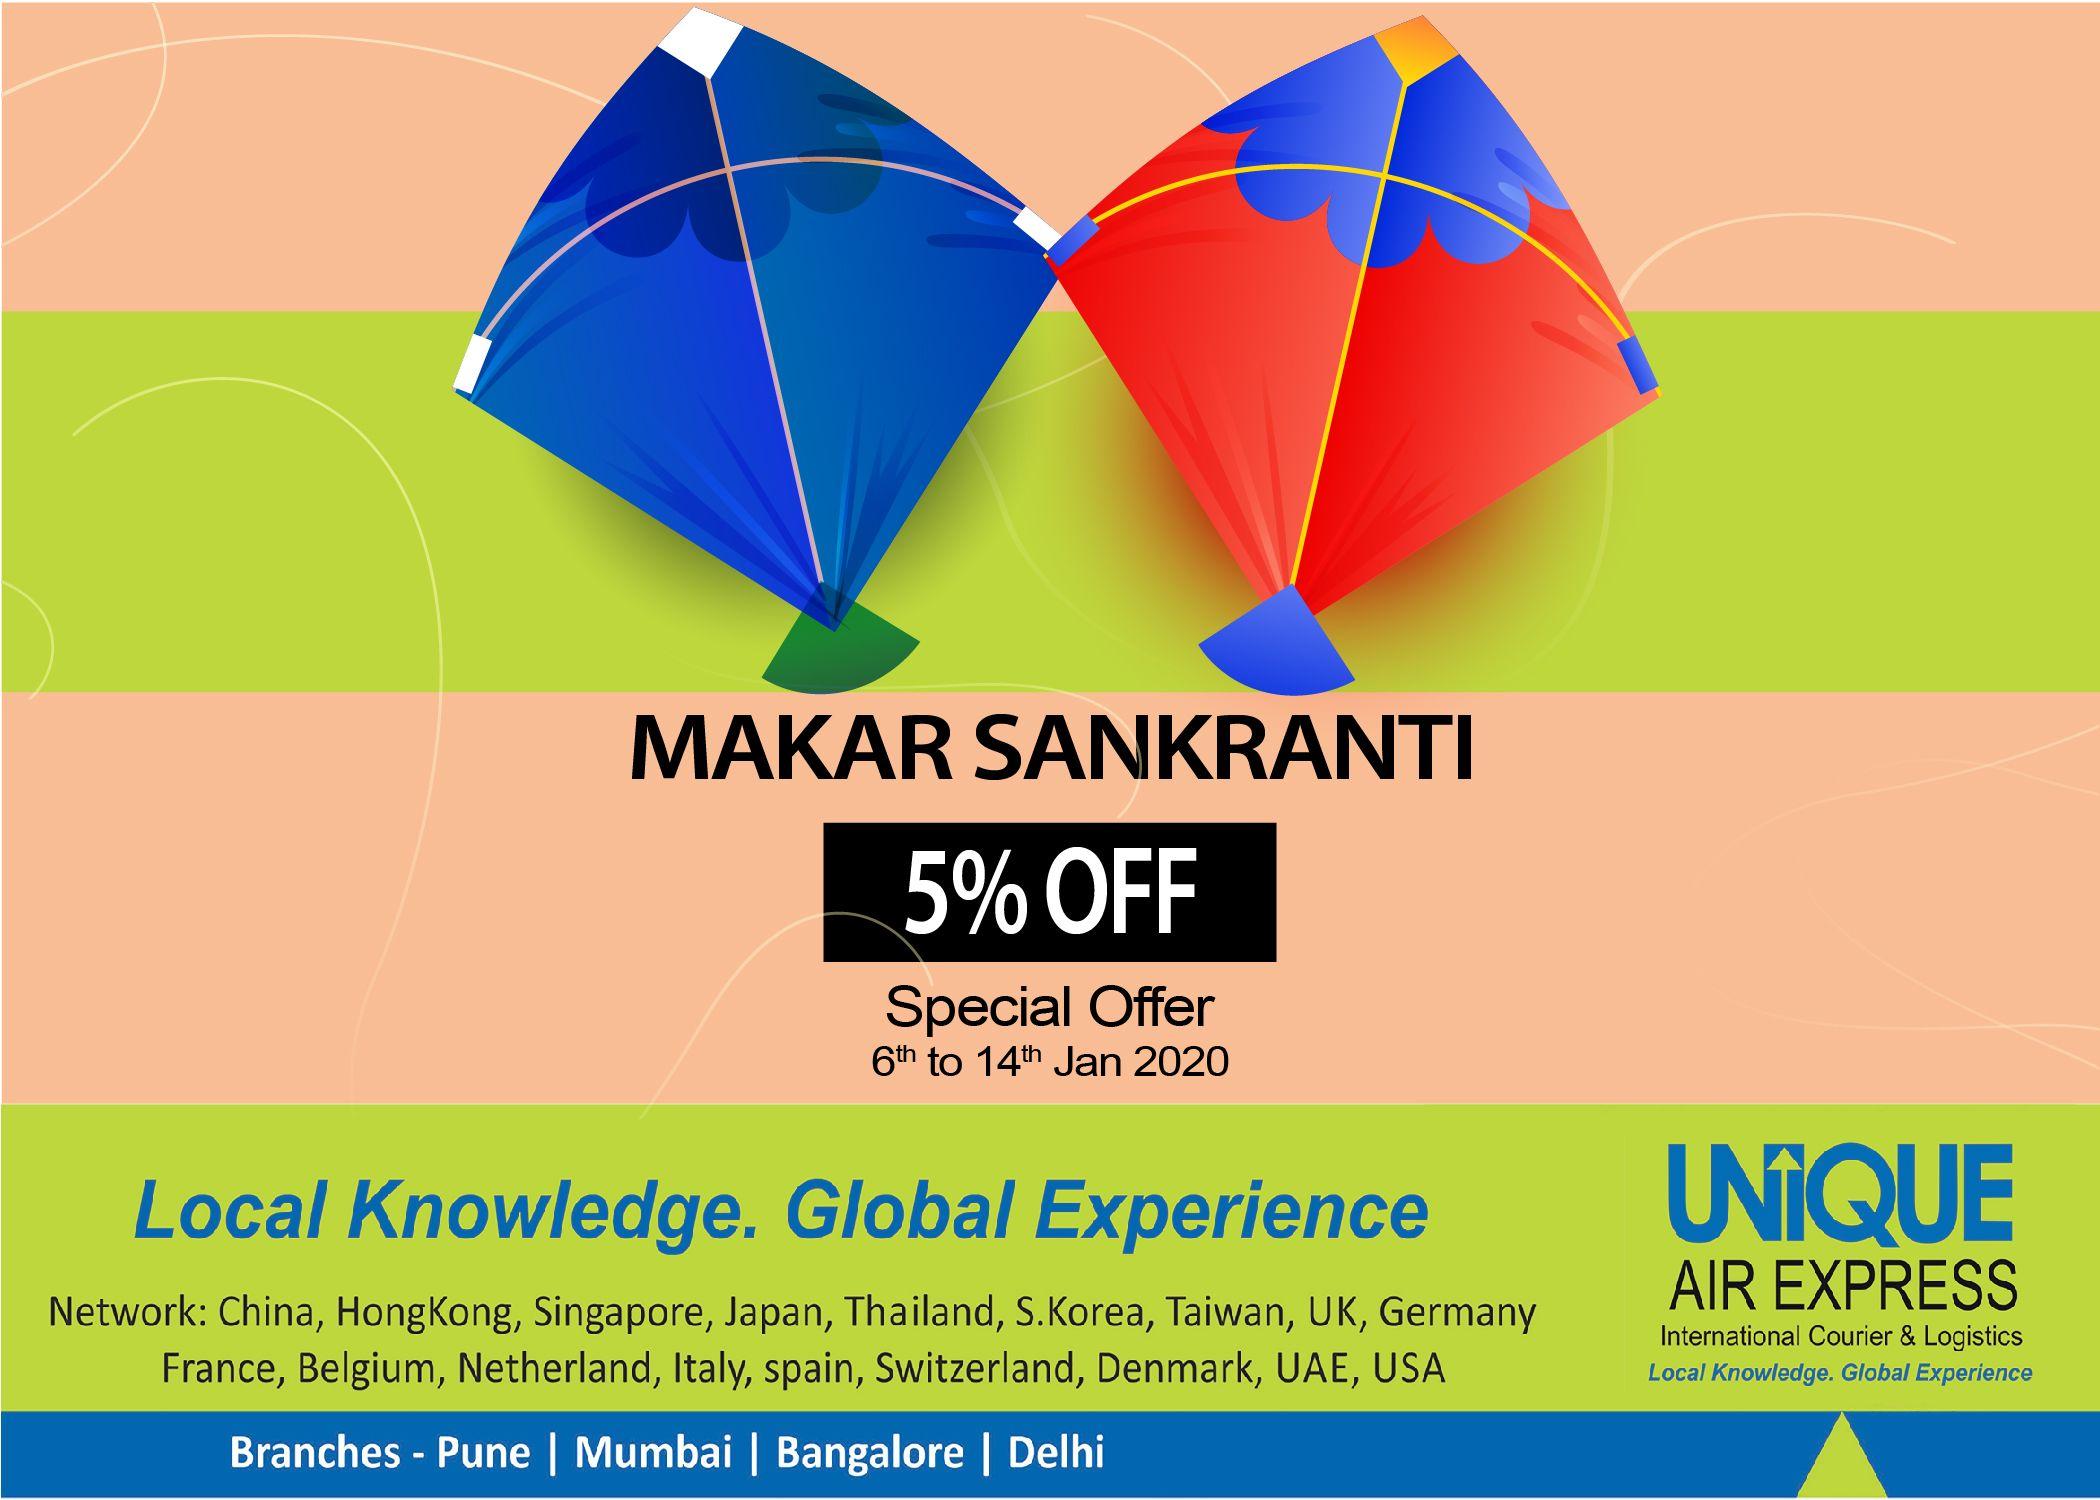 Makar Sankranti Bookings Started ! Send TilGul Sweets